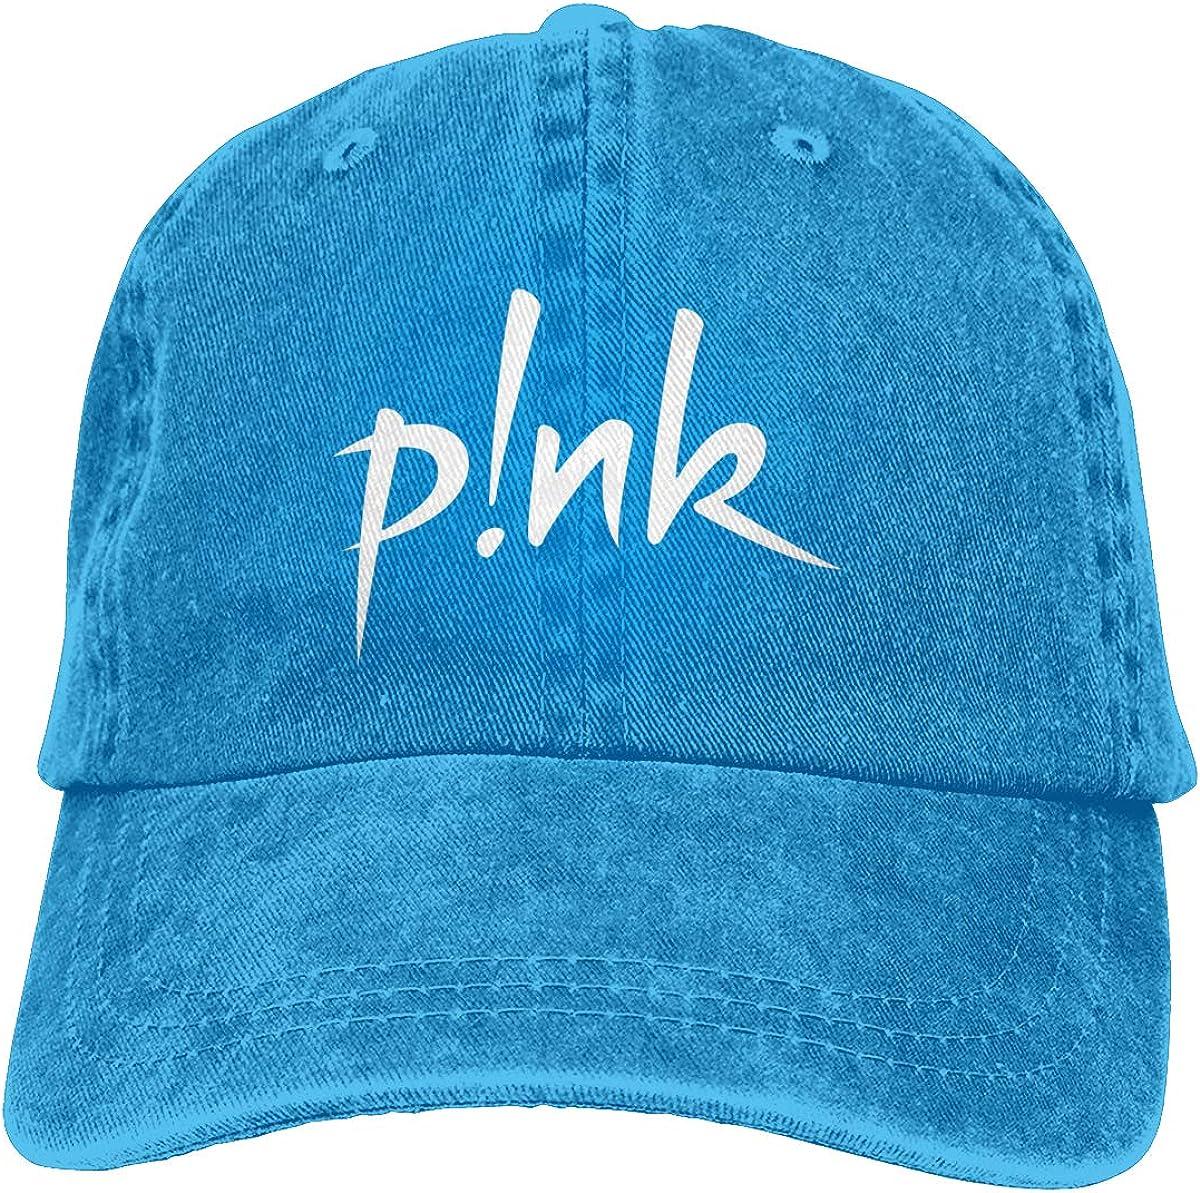 STACDO P!nk Unisex Vintage Adjustable Dad-Hat Custom Cowboy Hat